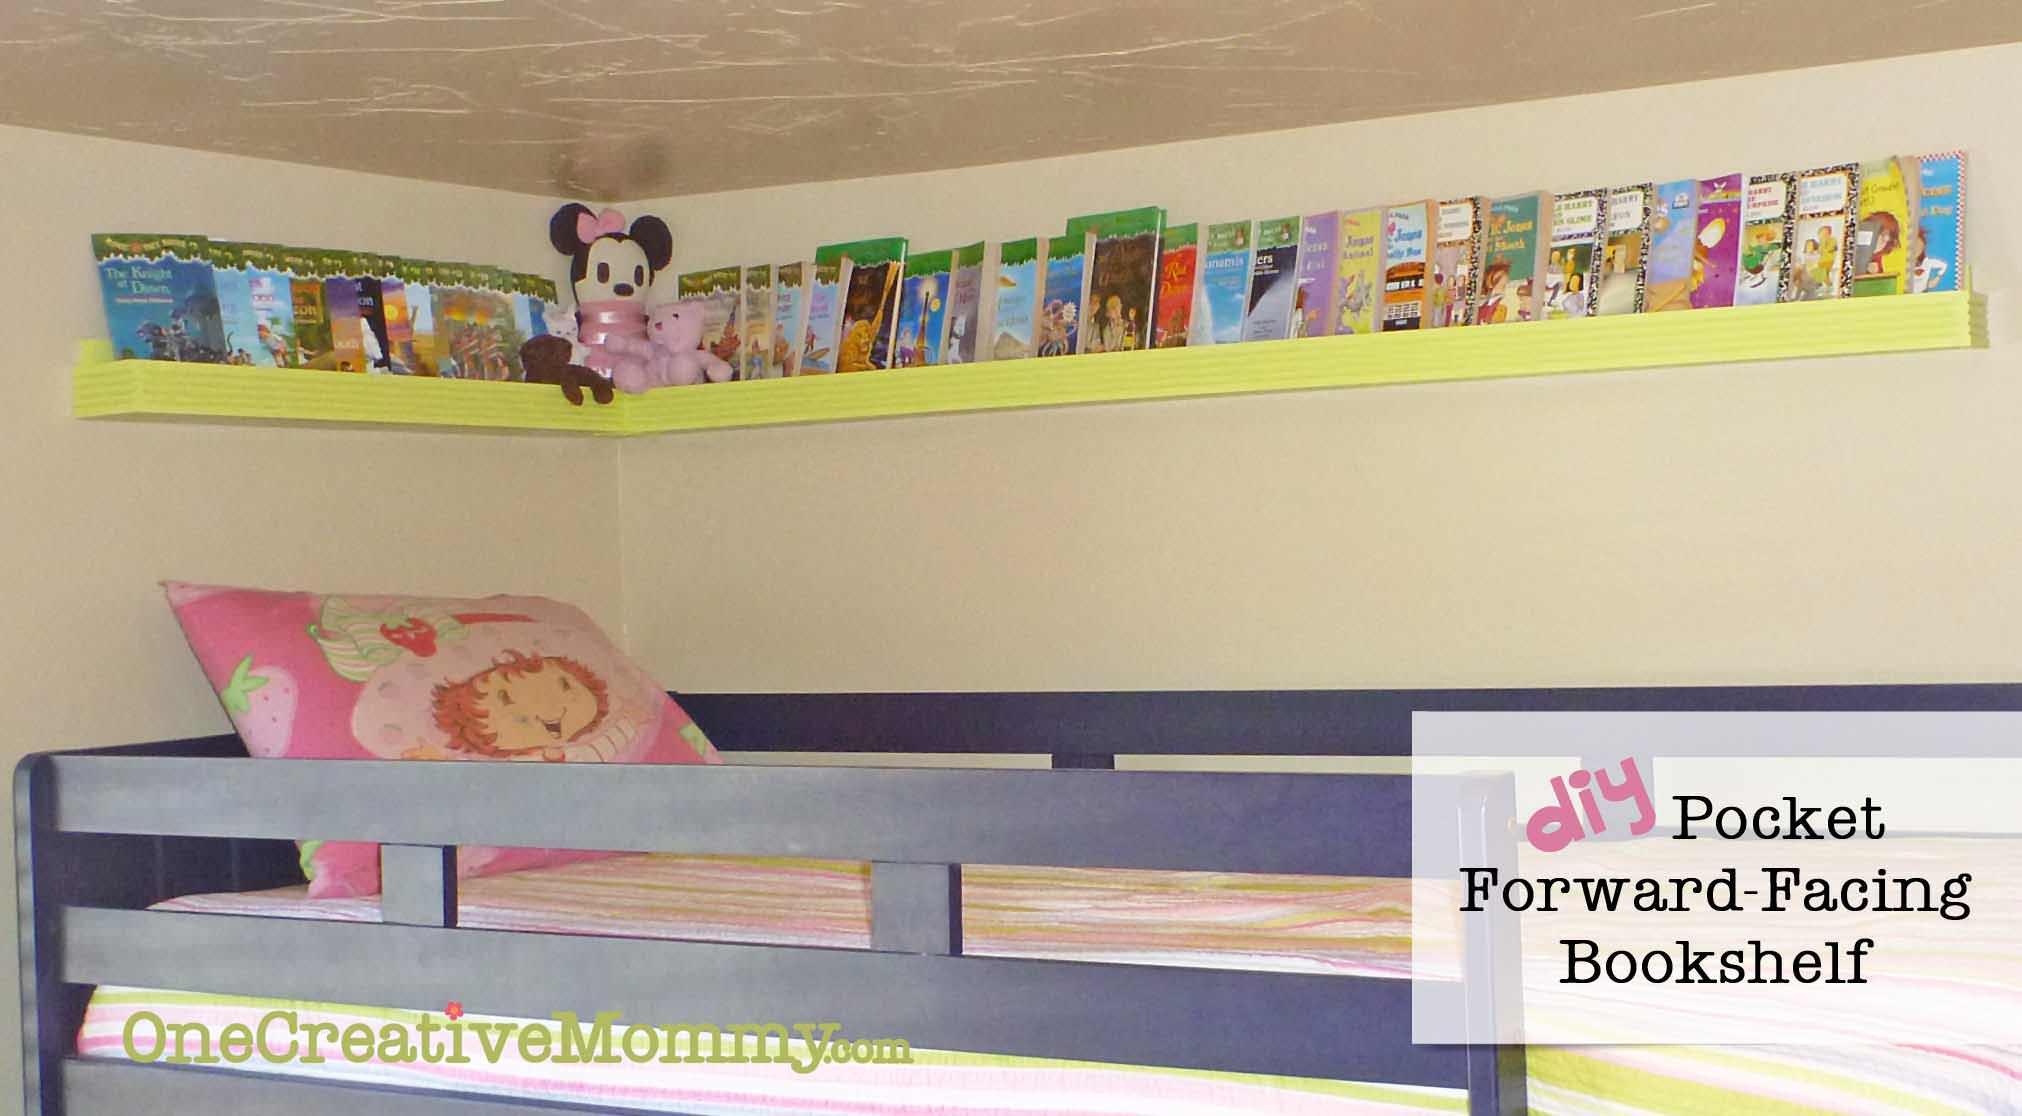 Admirable Diy Pocket Front Facing Book Shelves For Kids Interior Design Ideas Gresisoteloinfo